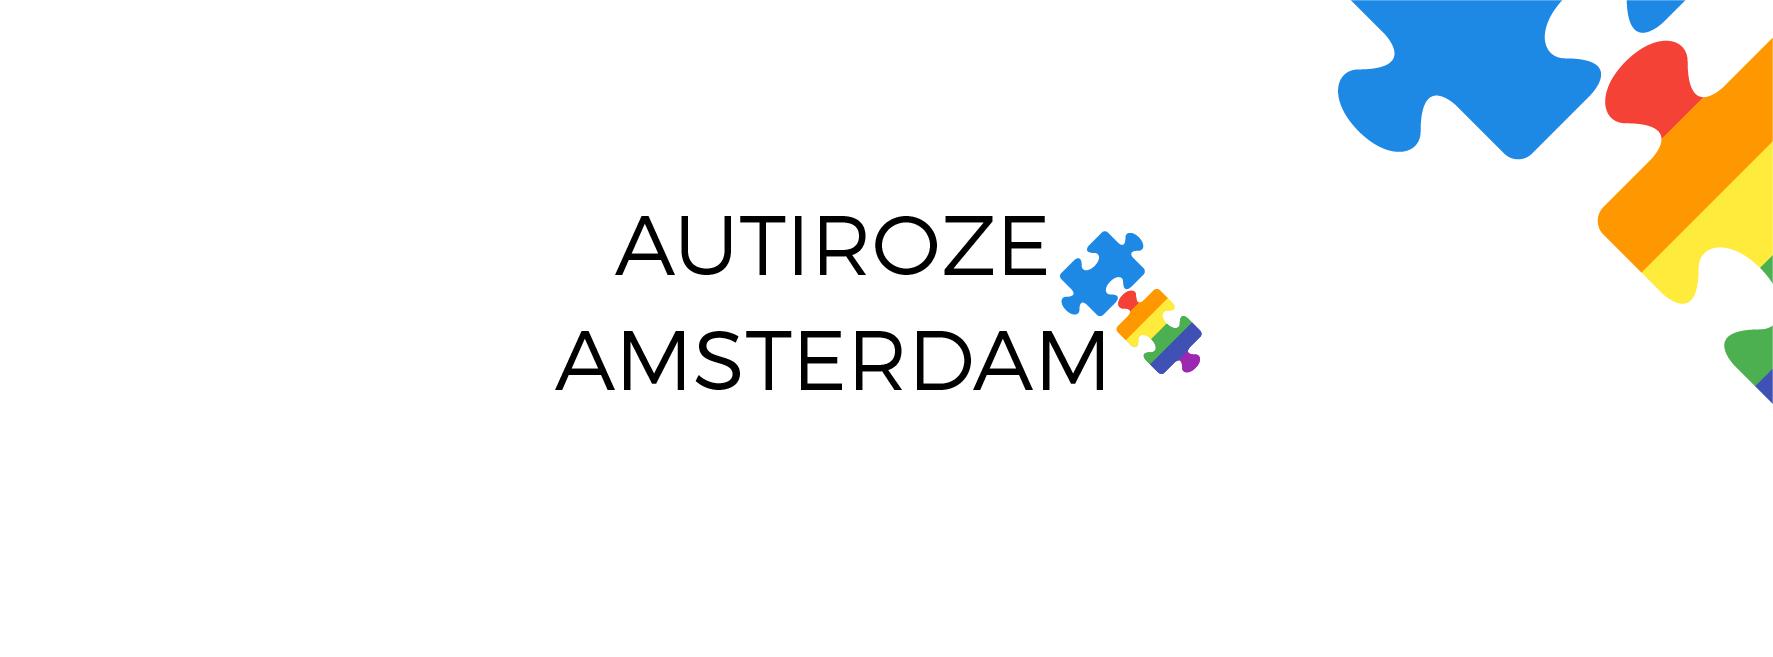 Autiroze Amsterdam